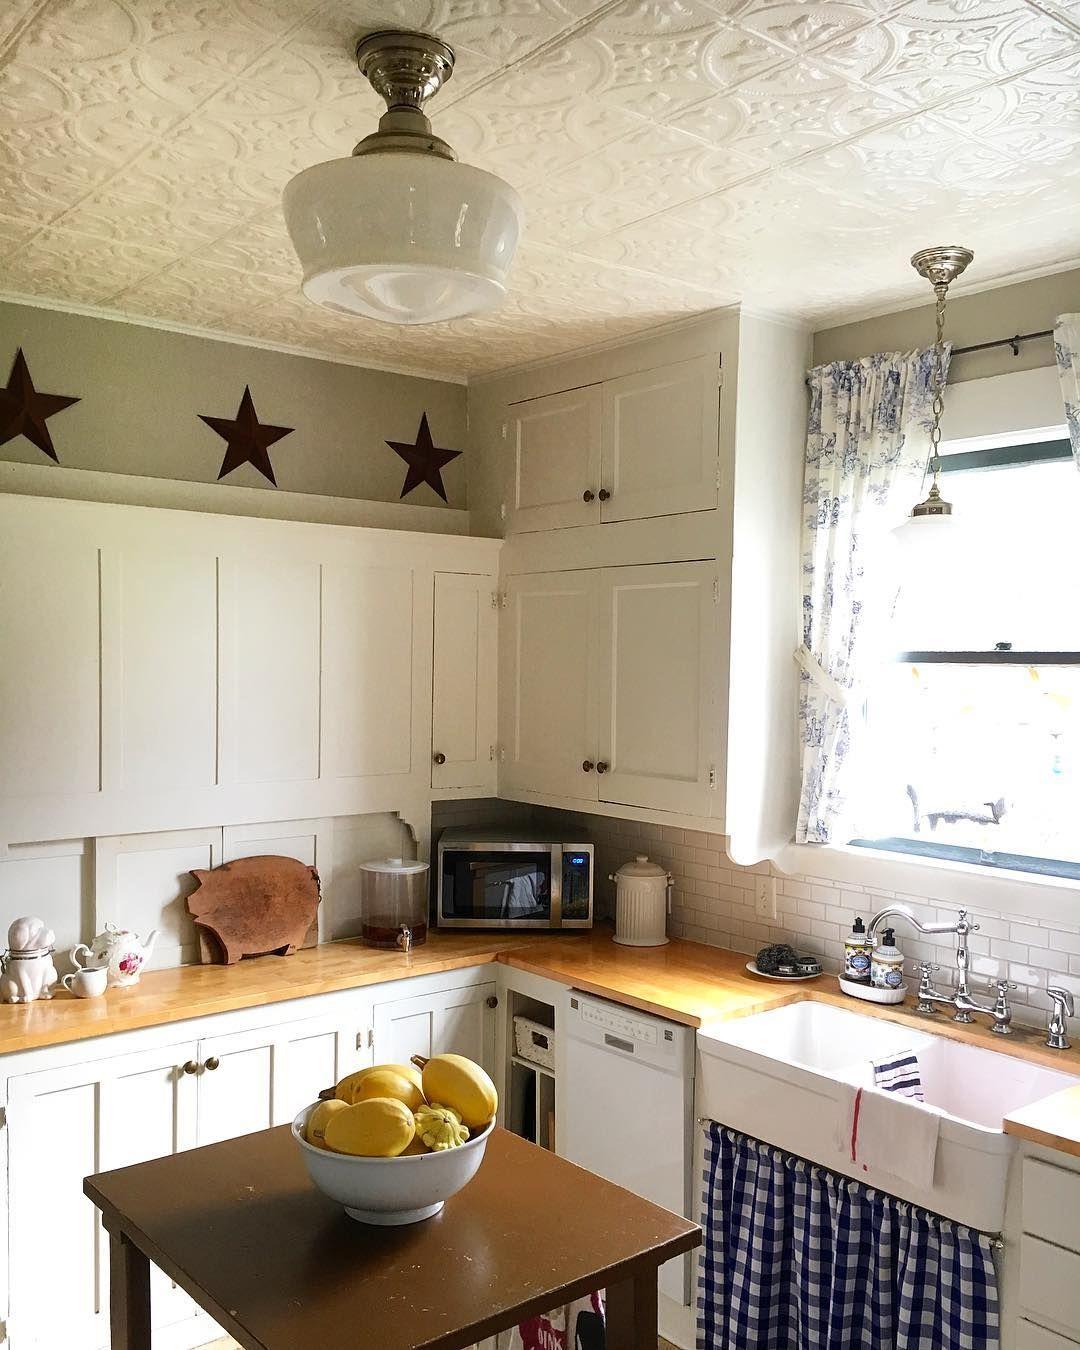 Farmhouse Kitchen Style Kitchen Remodel Kitchen Design Kitchen Style